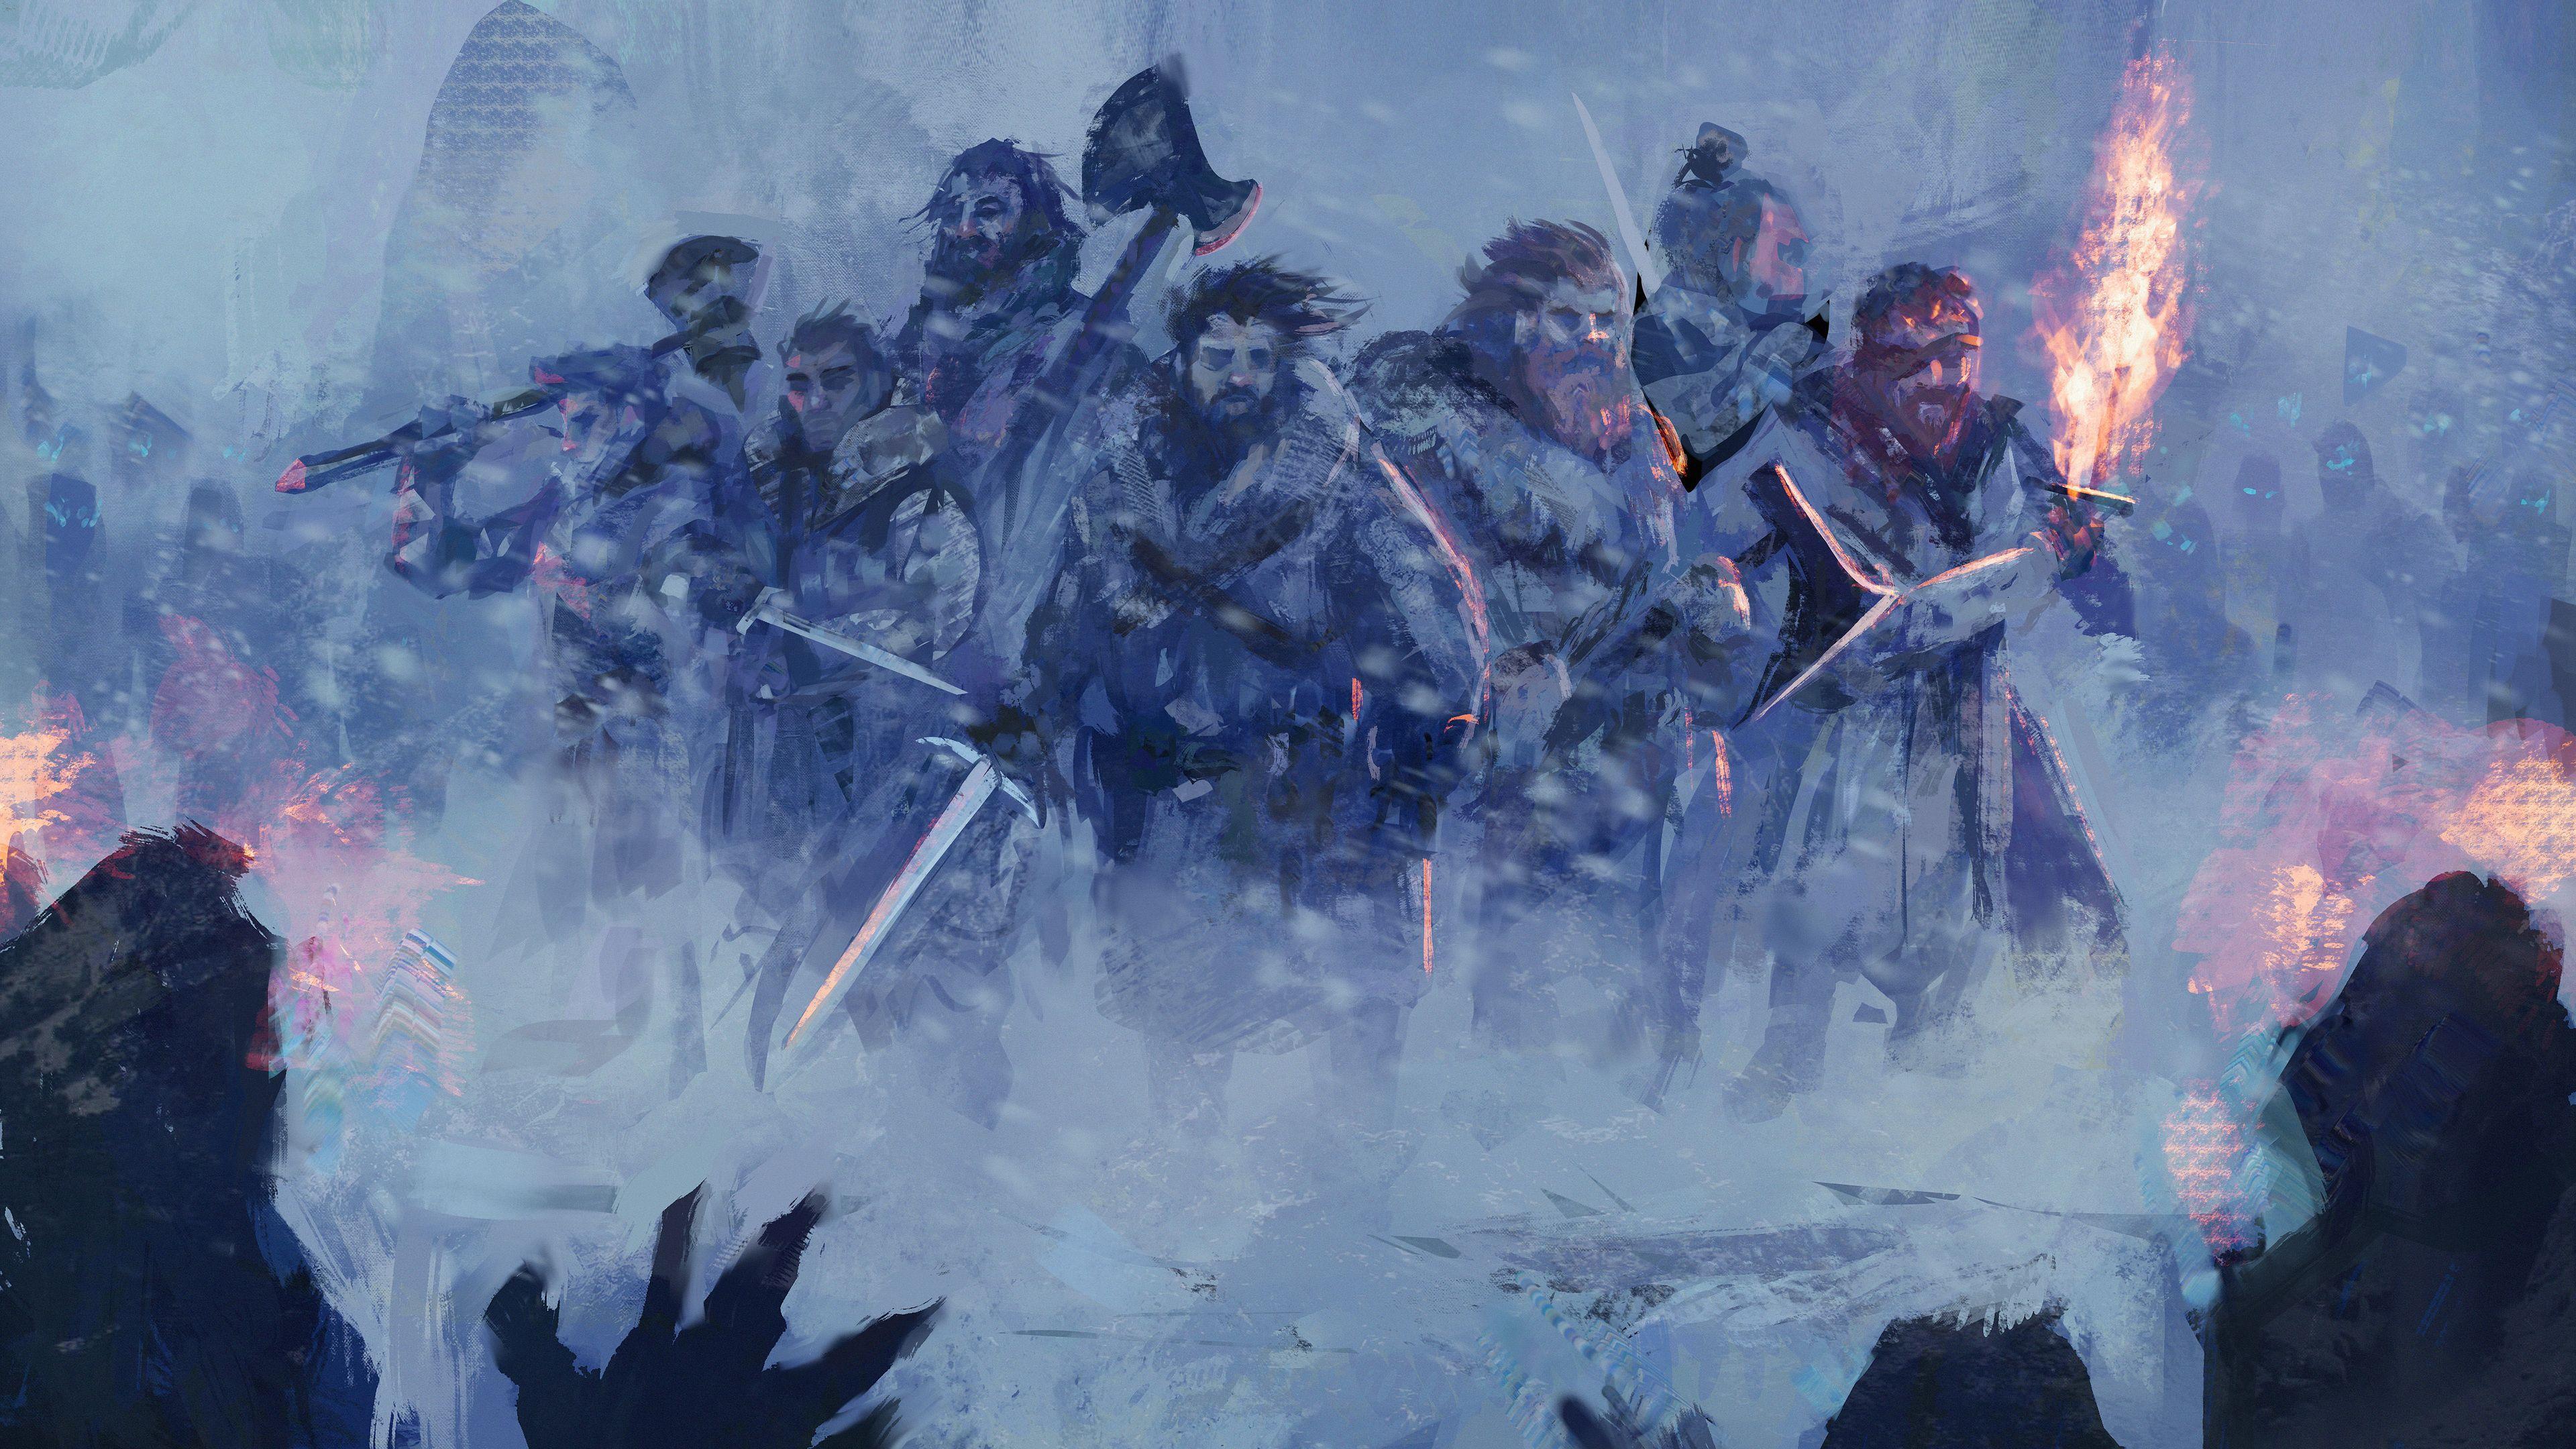 Some Got Wallpapers Wallpaper Post Game Of Thrones Art Wallpaper Free Download Online Art Gallery